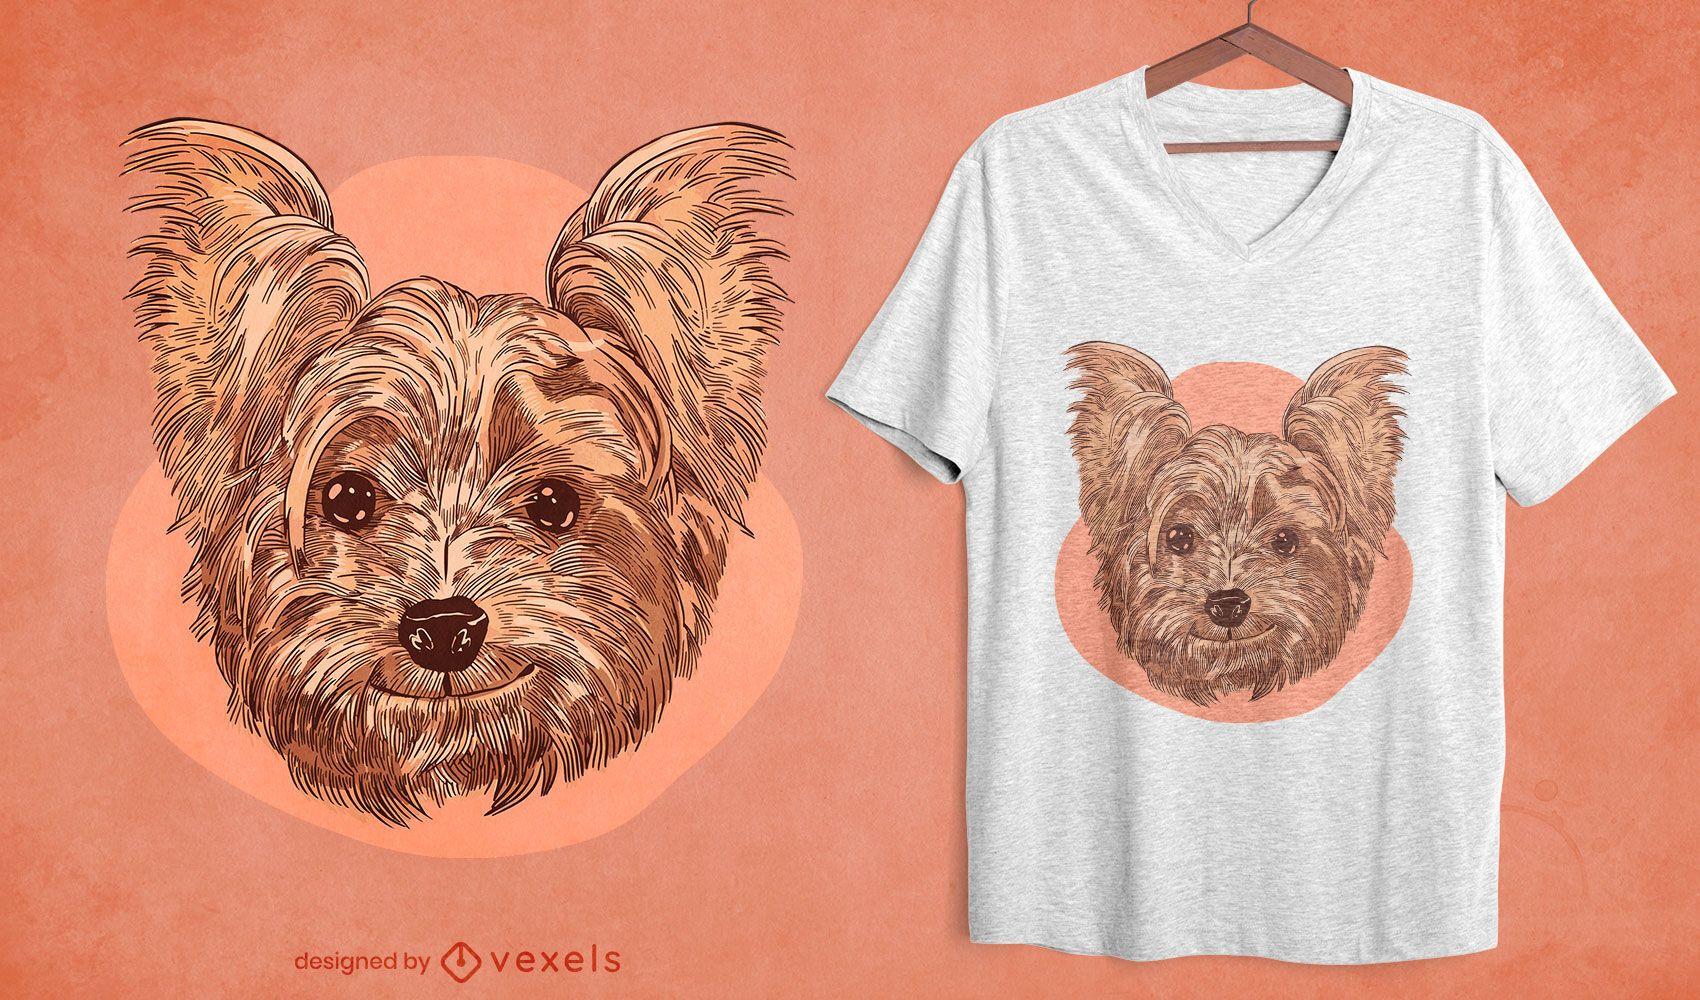 Dog smiling t-shirt design